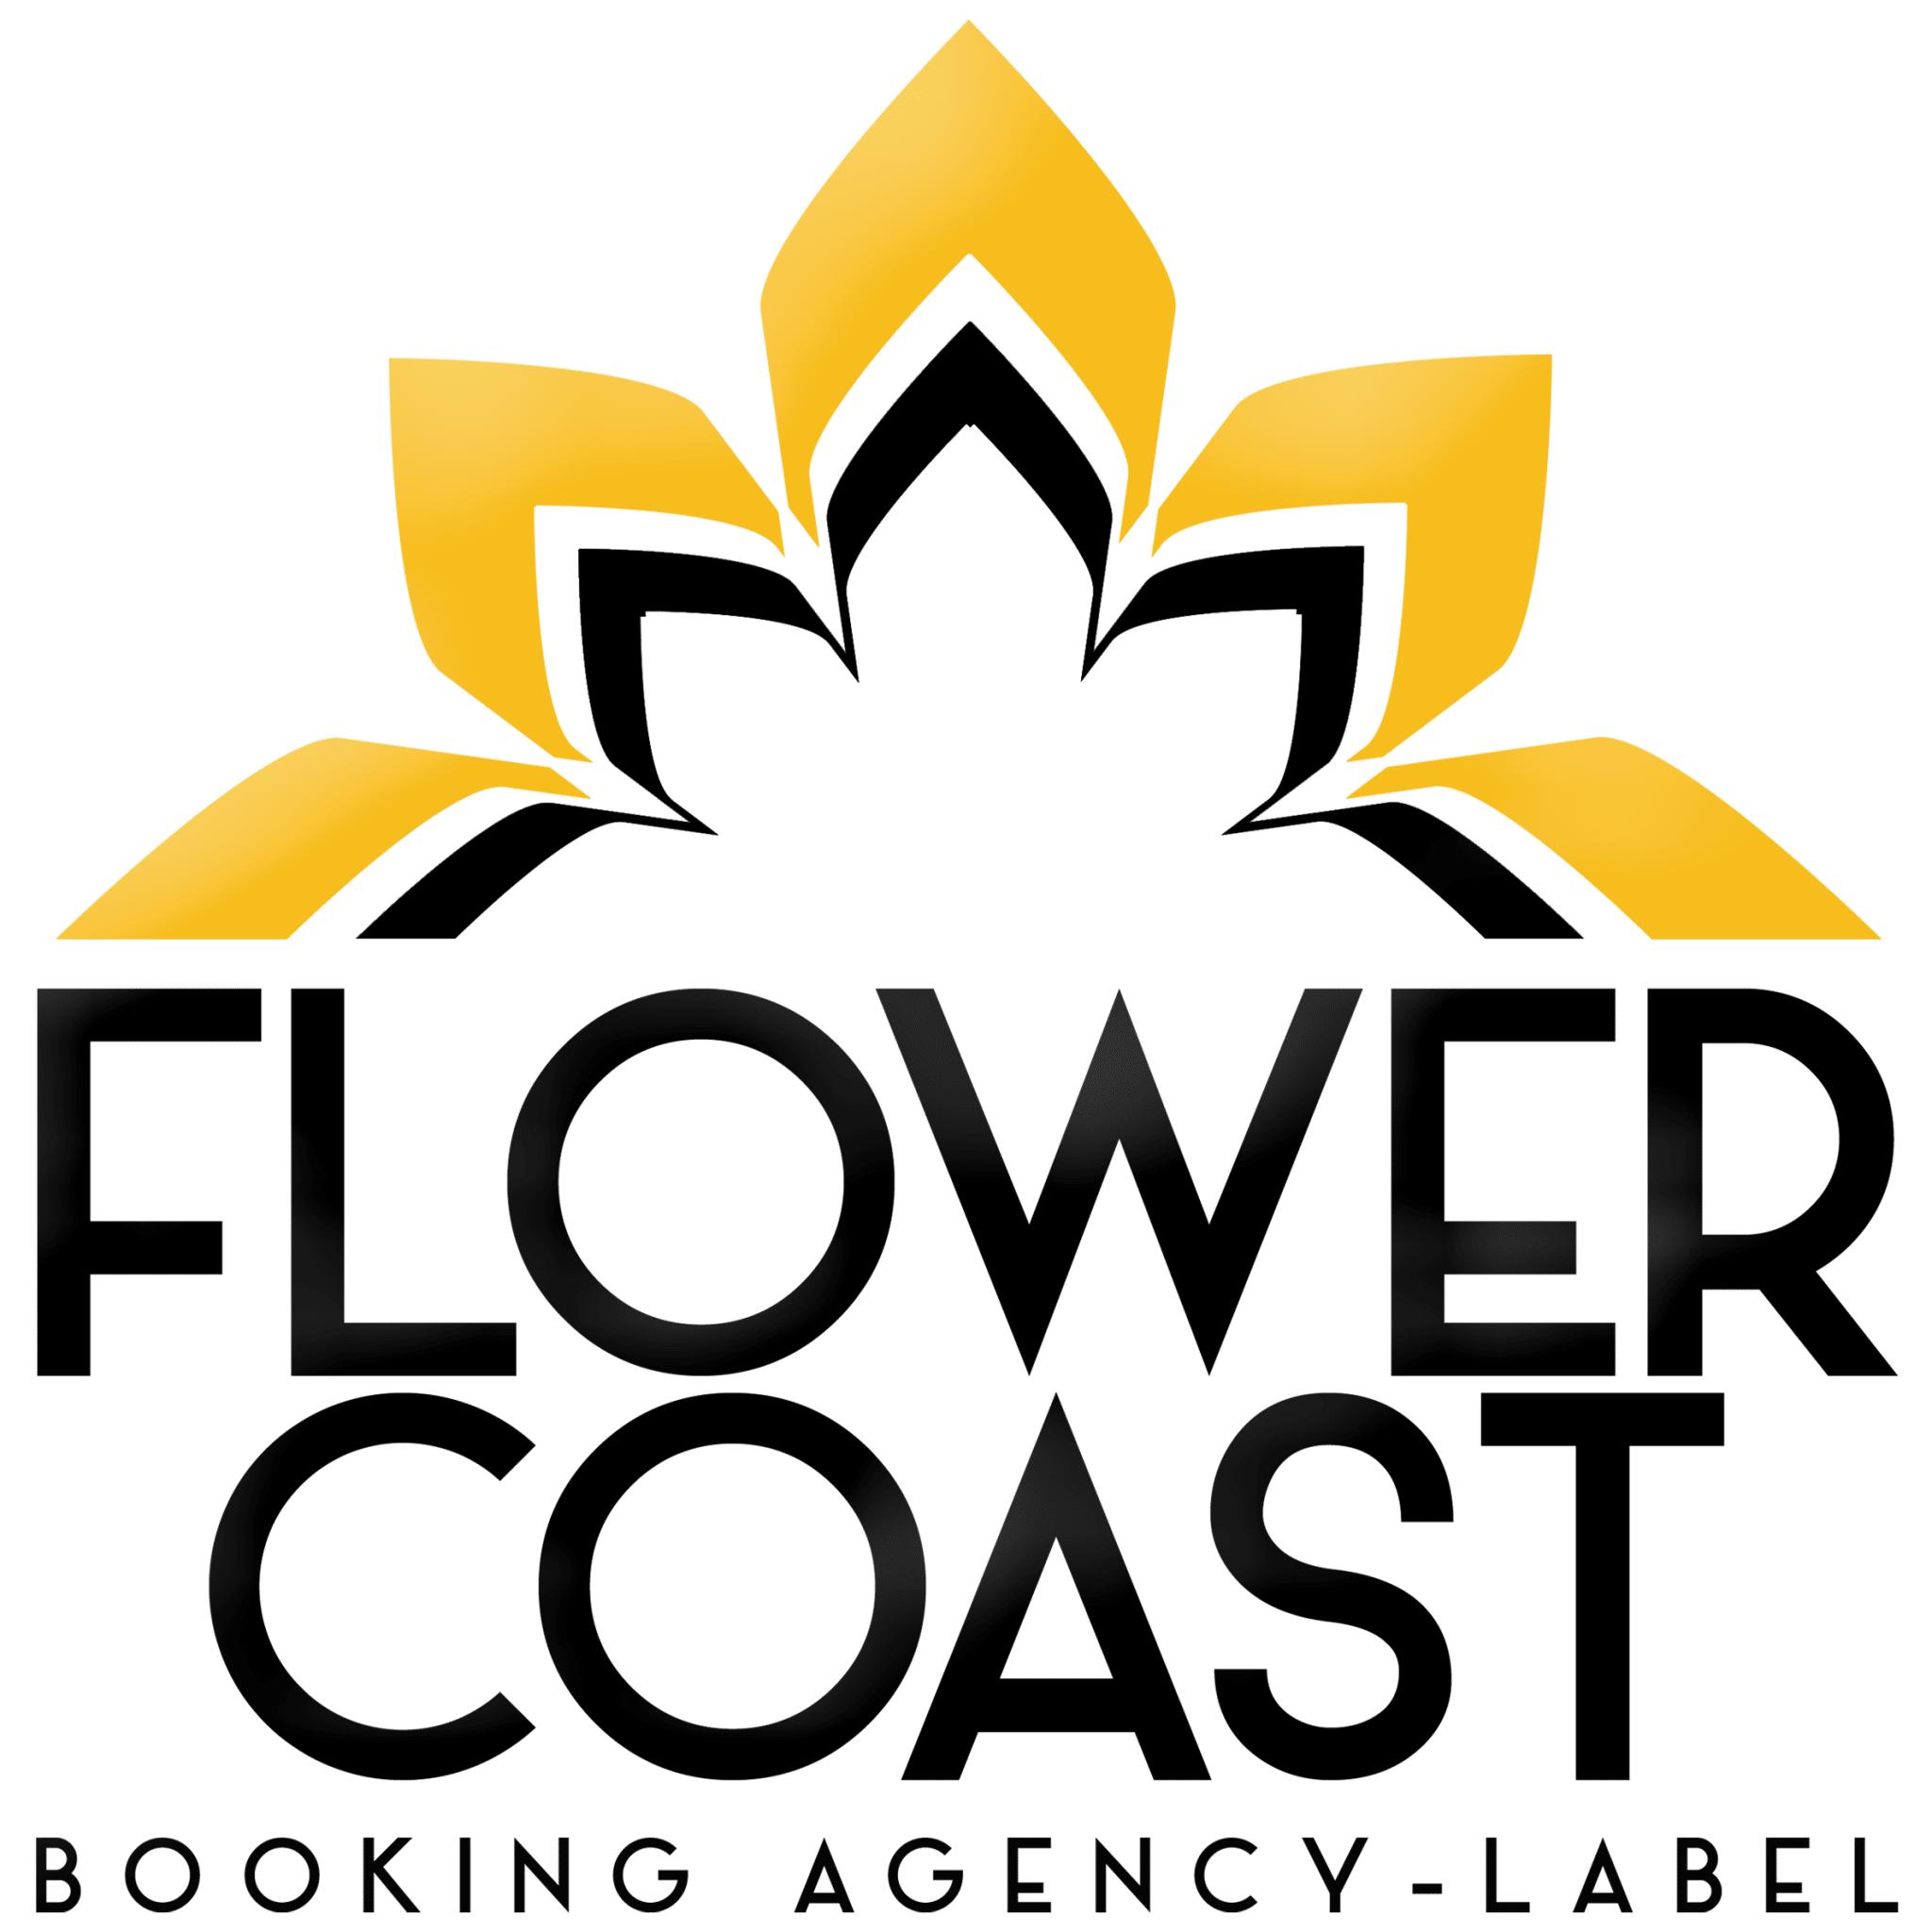 Flower Coast